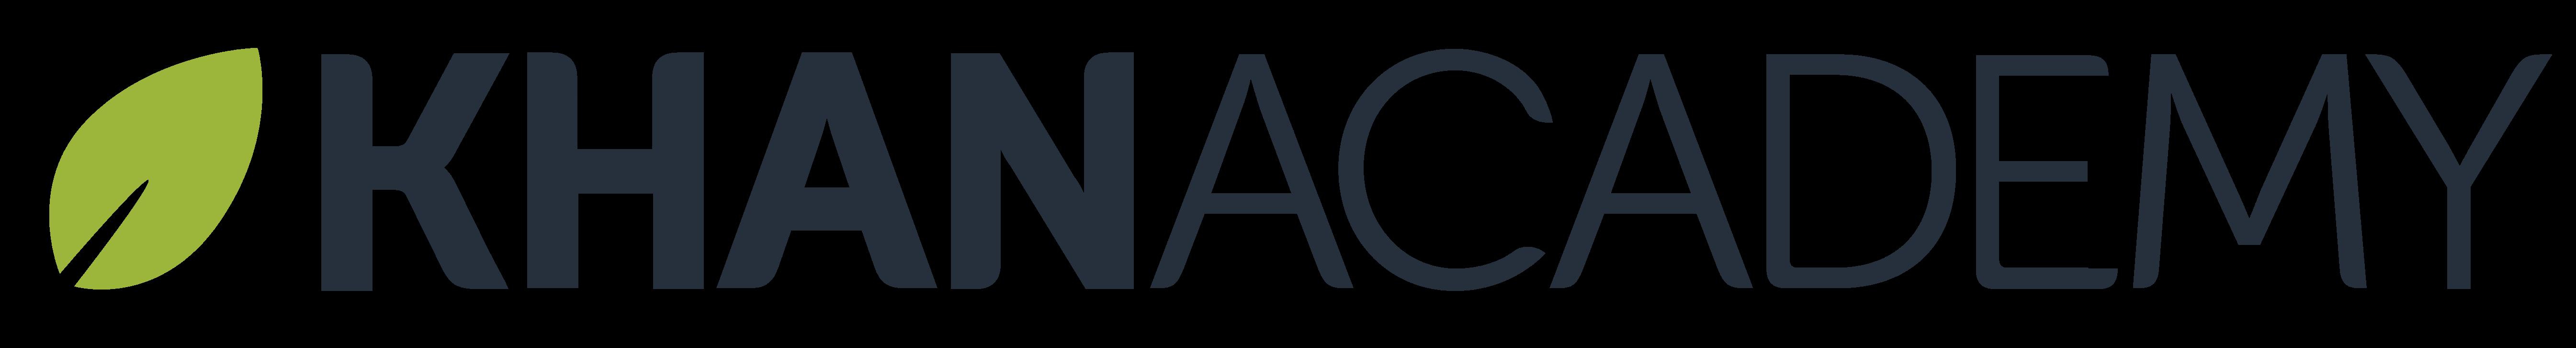 Khan Academy Logos Download